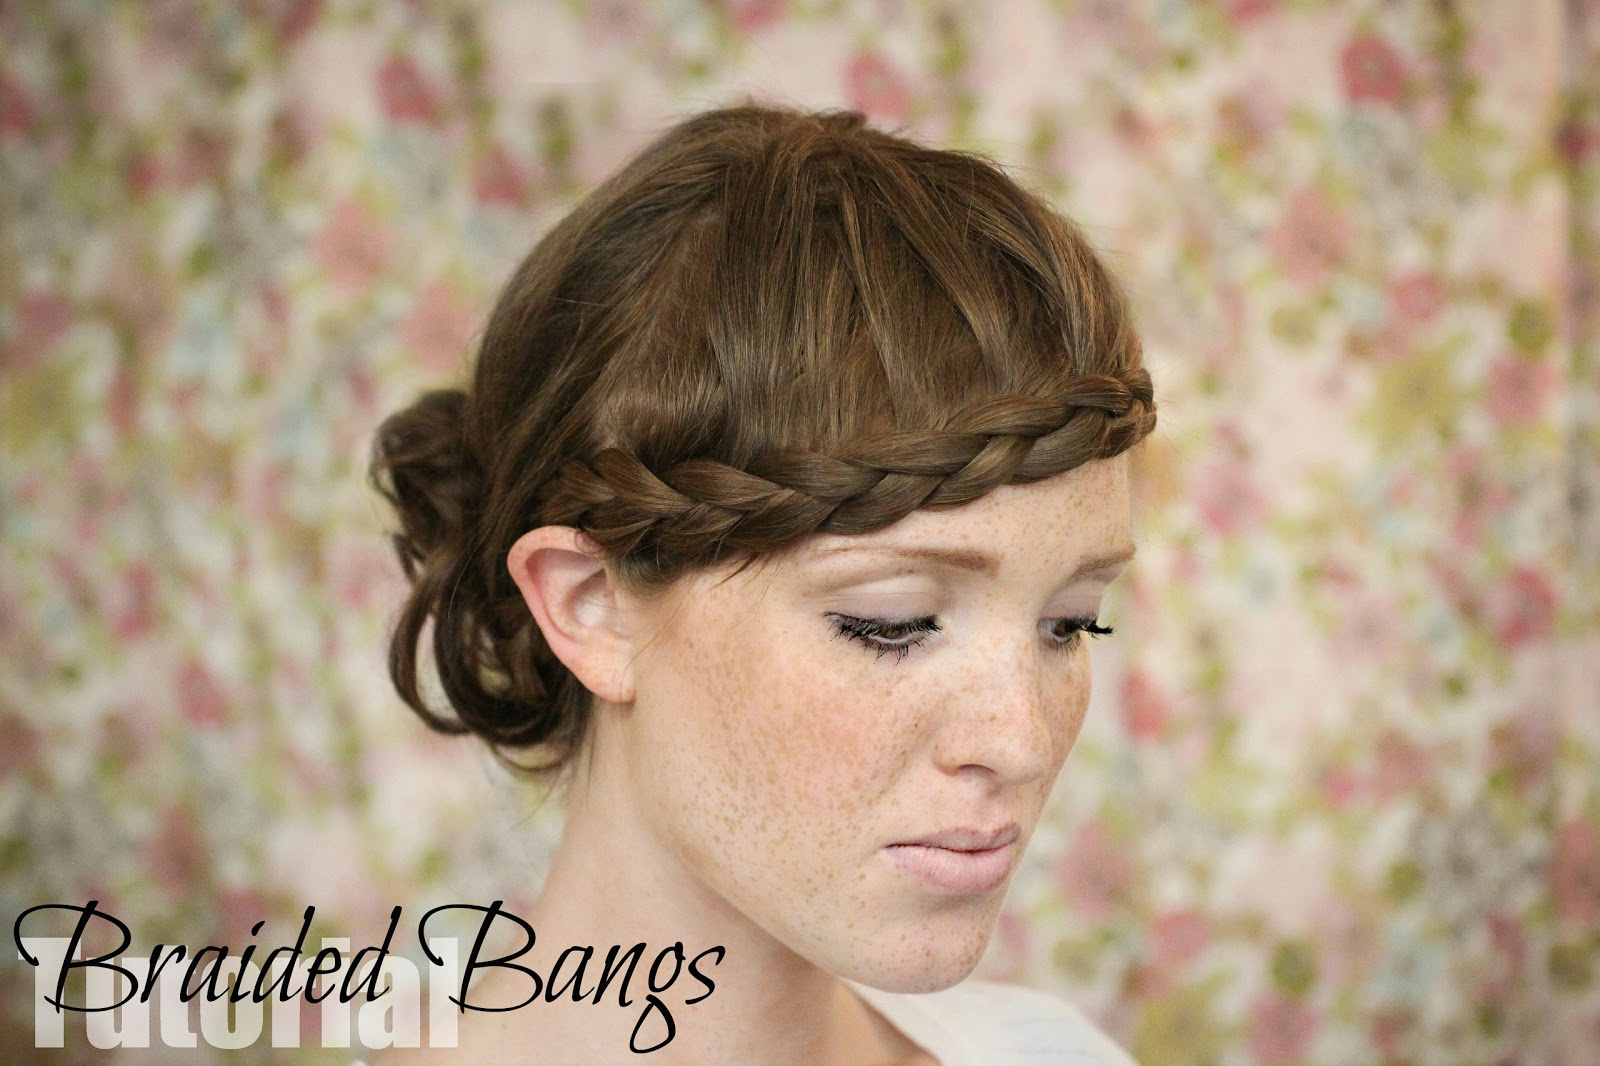 braided bangs tutorial - photo #6